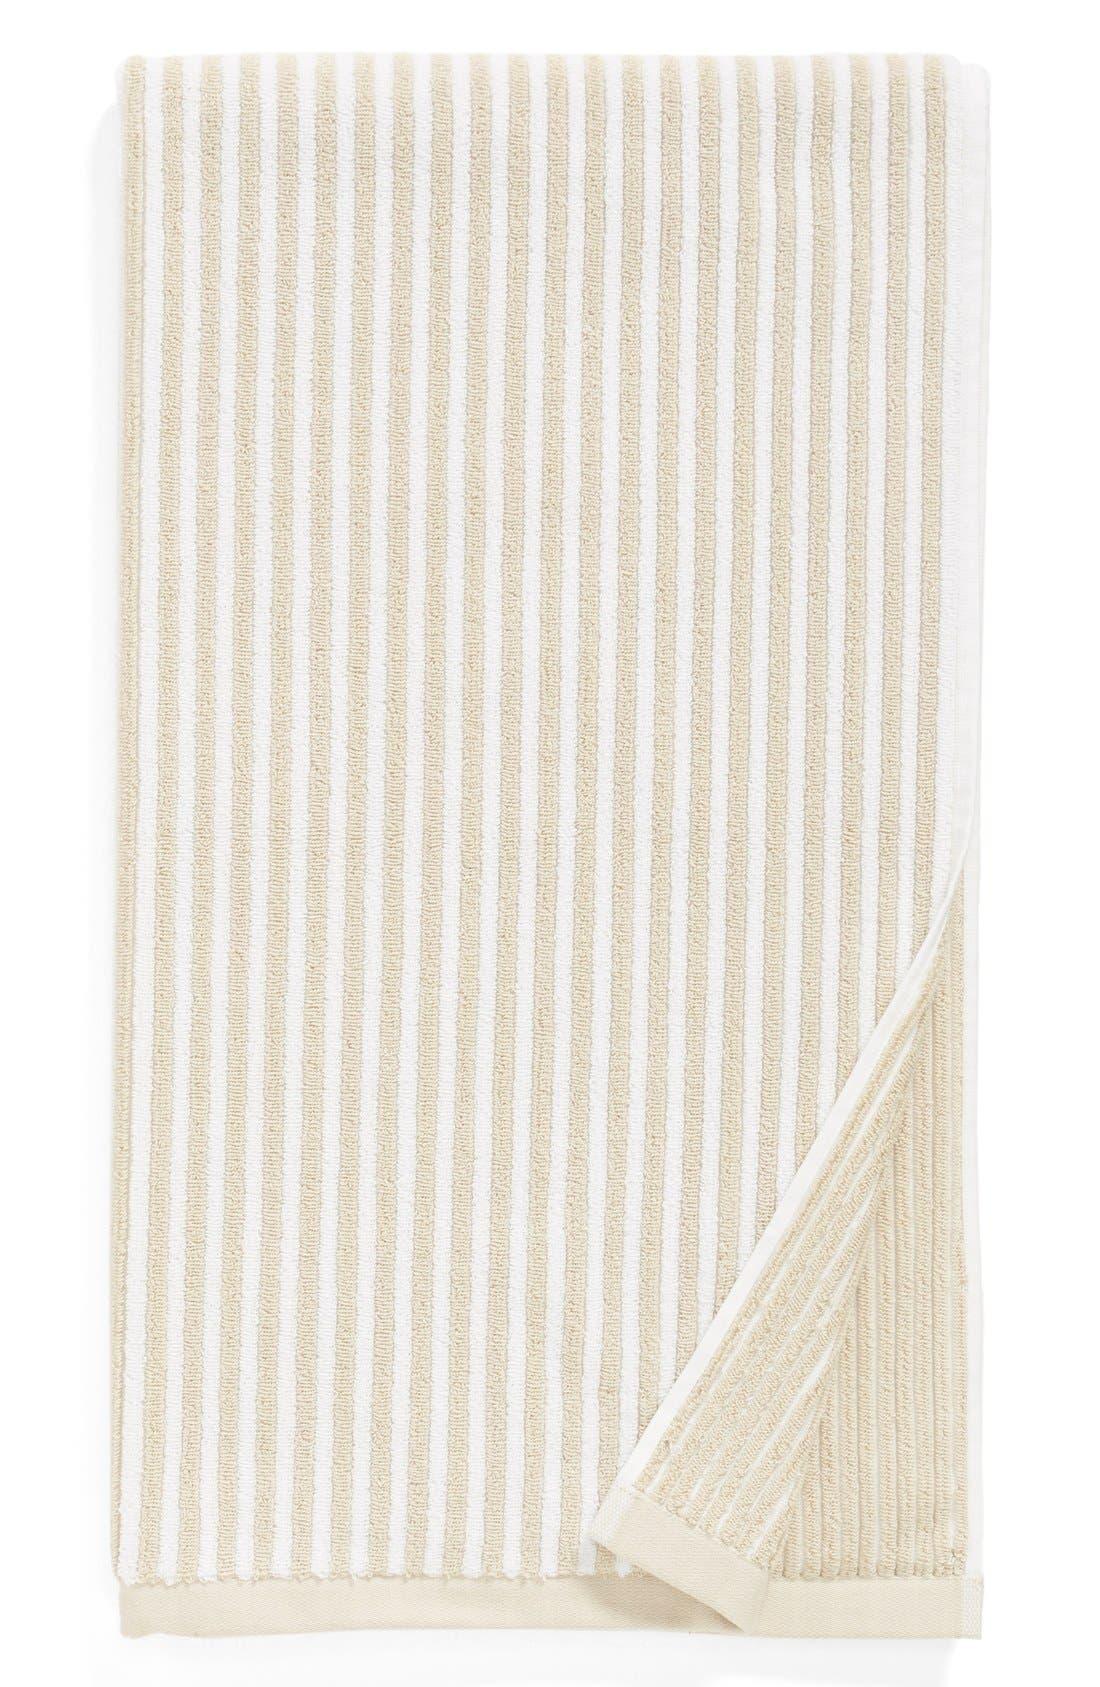 Alternate Image 1 Selected - Nordstrom at Home 'Stria' Bath Towel